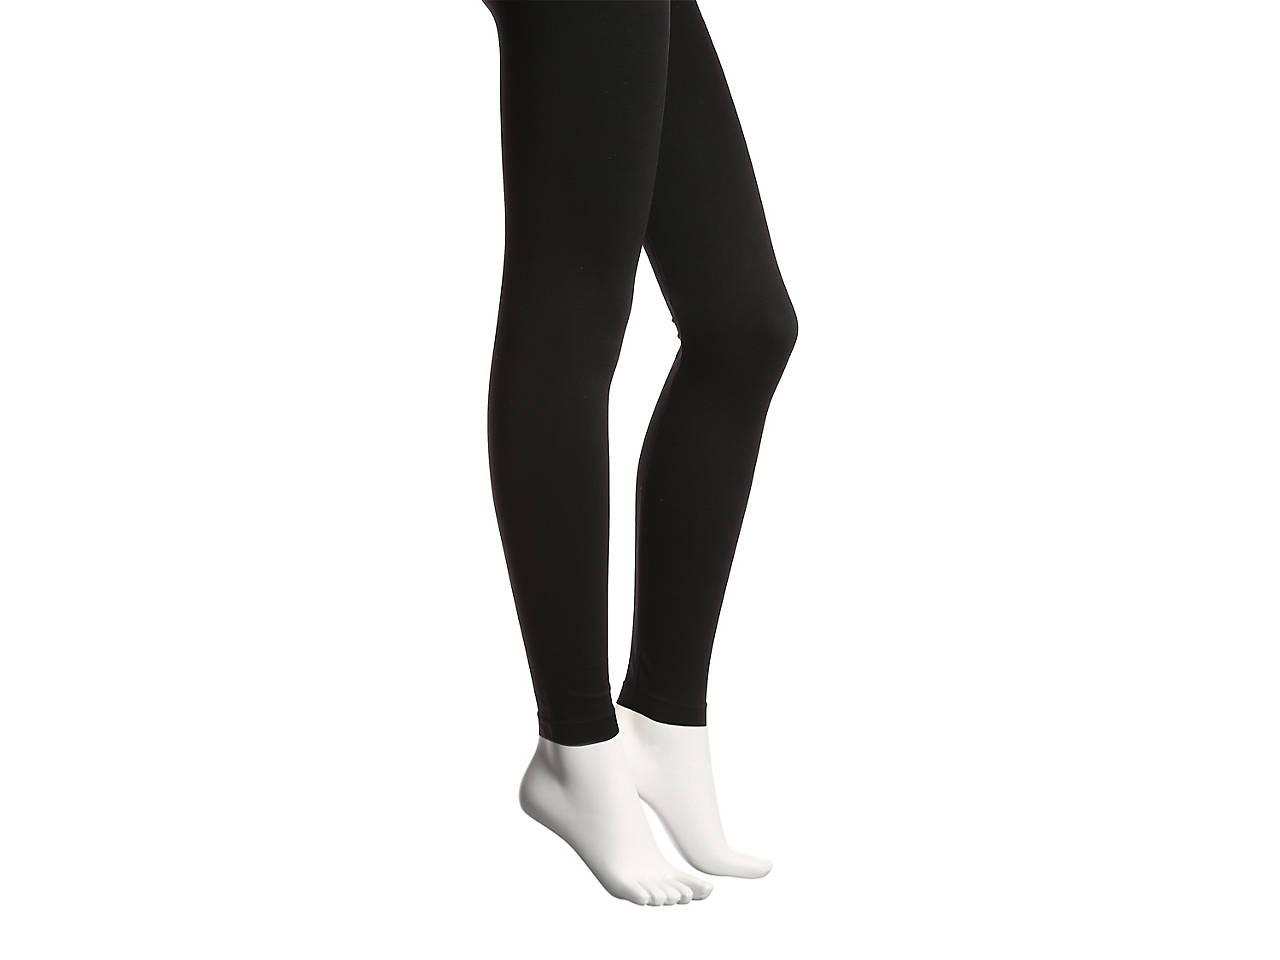 771f920157c10 Via Spiga - Luxury Seamless Microfiber Women's Leggings Women's ...